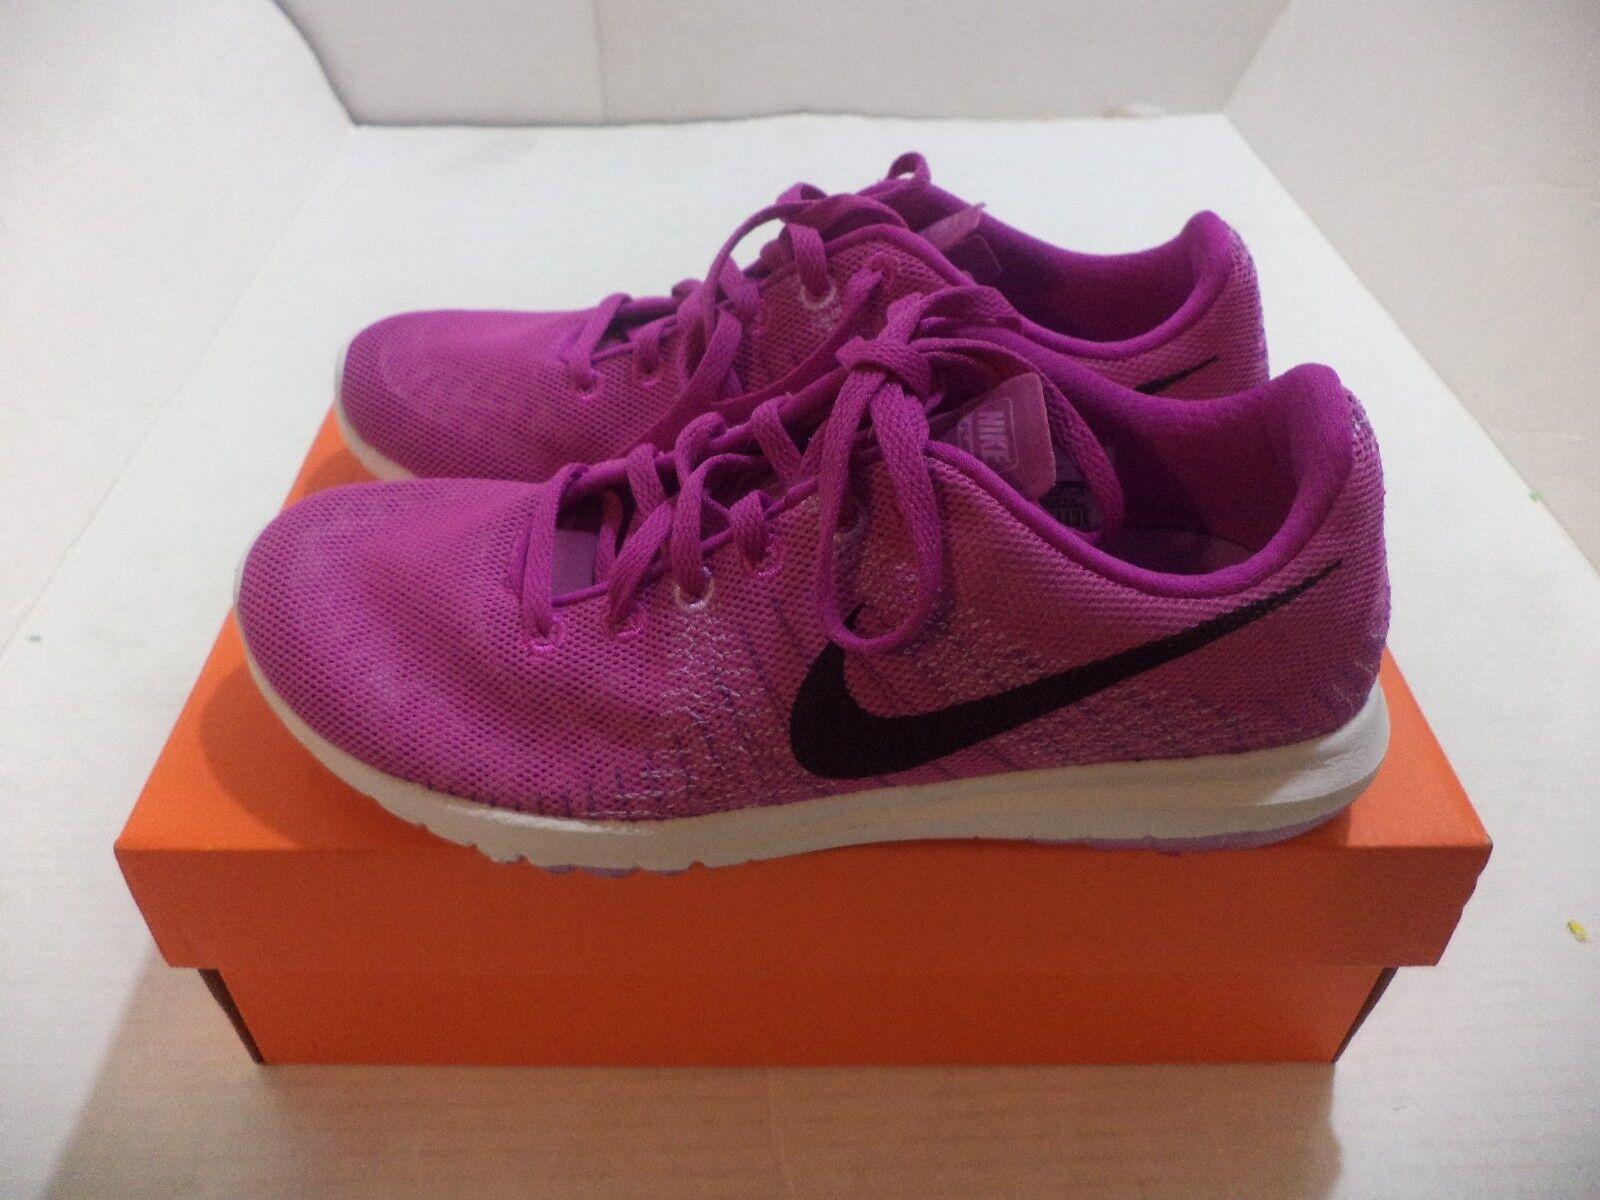 Nike Flex Fury Women Running Shoes Size 6-7.5 Color Fchs Flsh/Blck/Fchs Glw/Bld